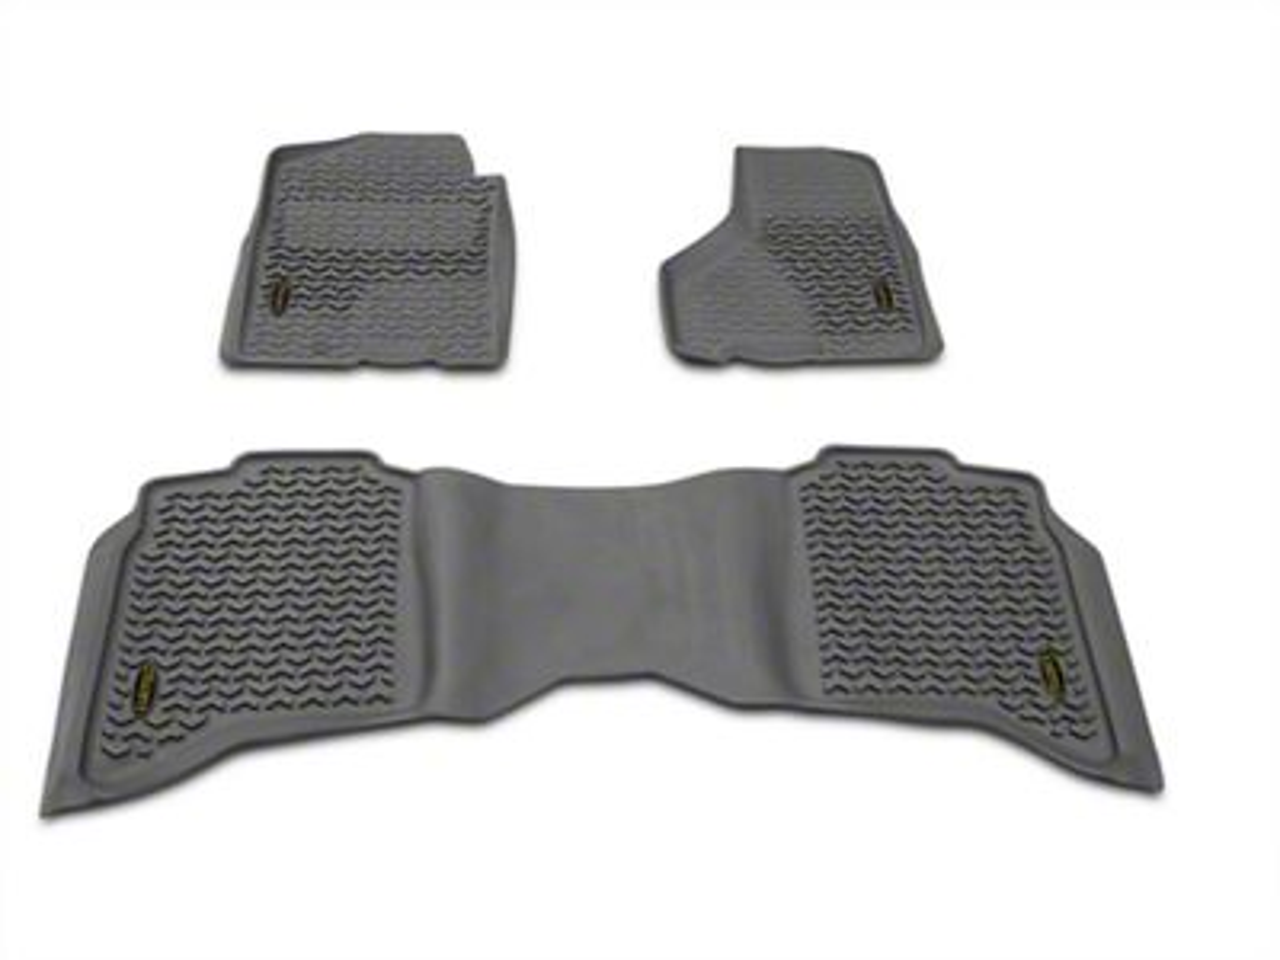 Barricade Front & Rear Floor Mats - Gray (09-18 RAM 1500 Crew Cab)